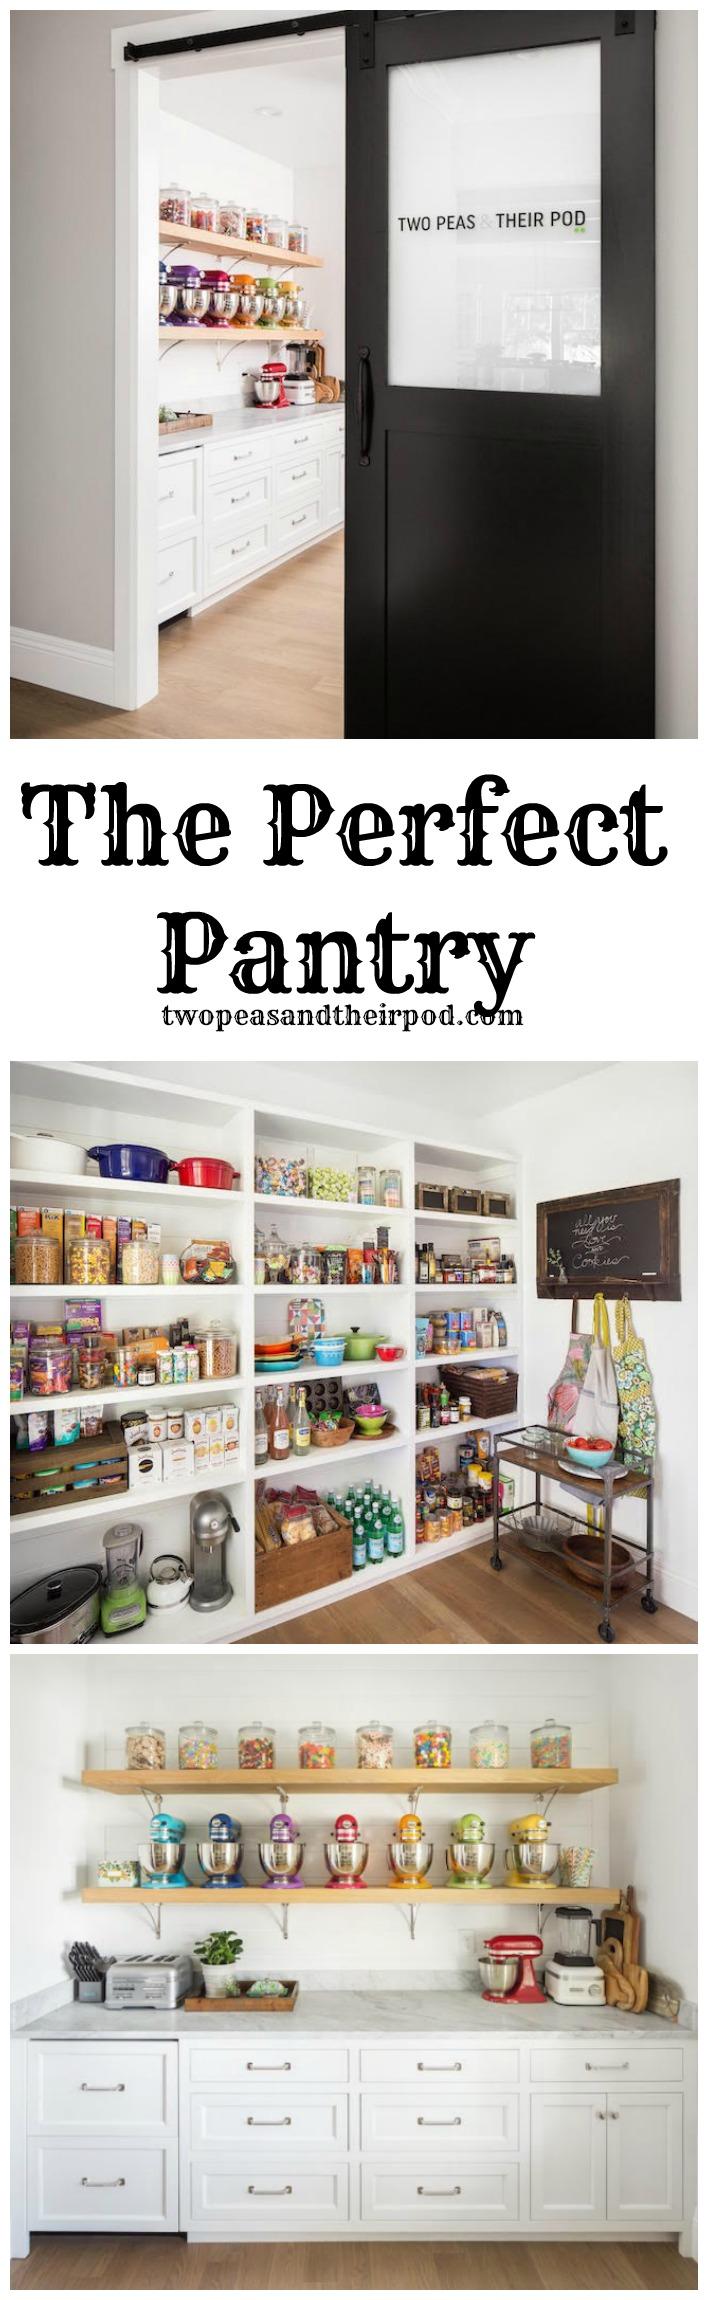 Take a Tour of this DREAMY pantry on twopeasandtheirpod.com